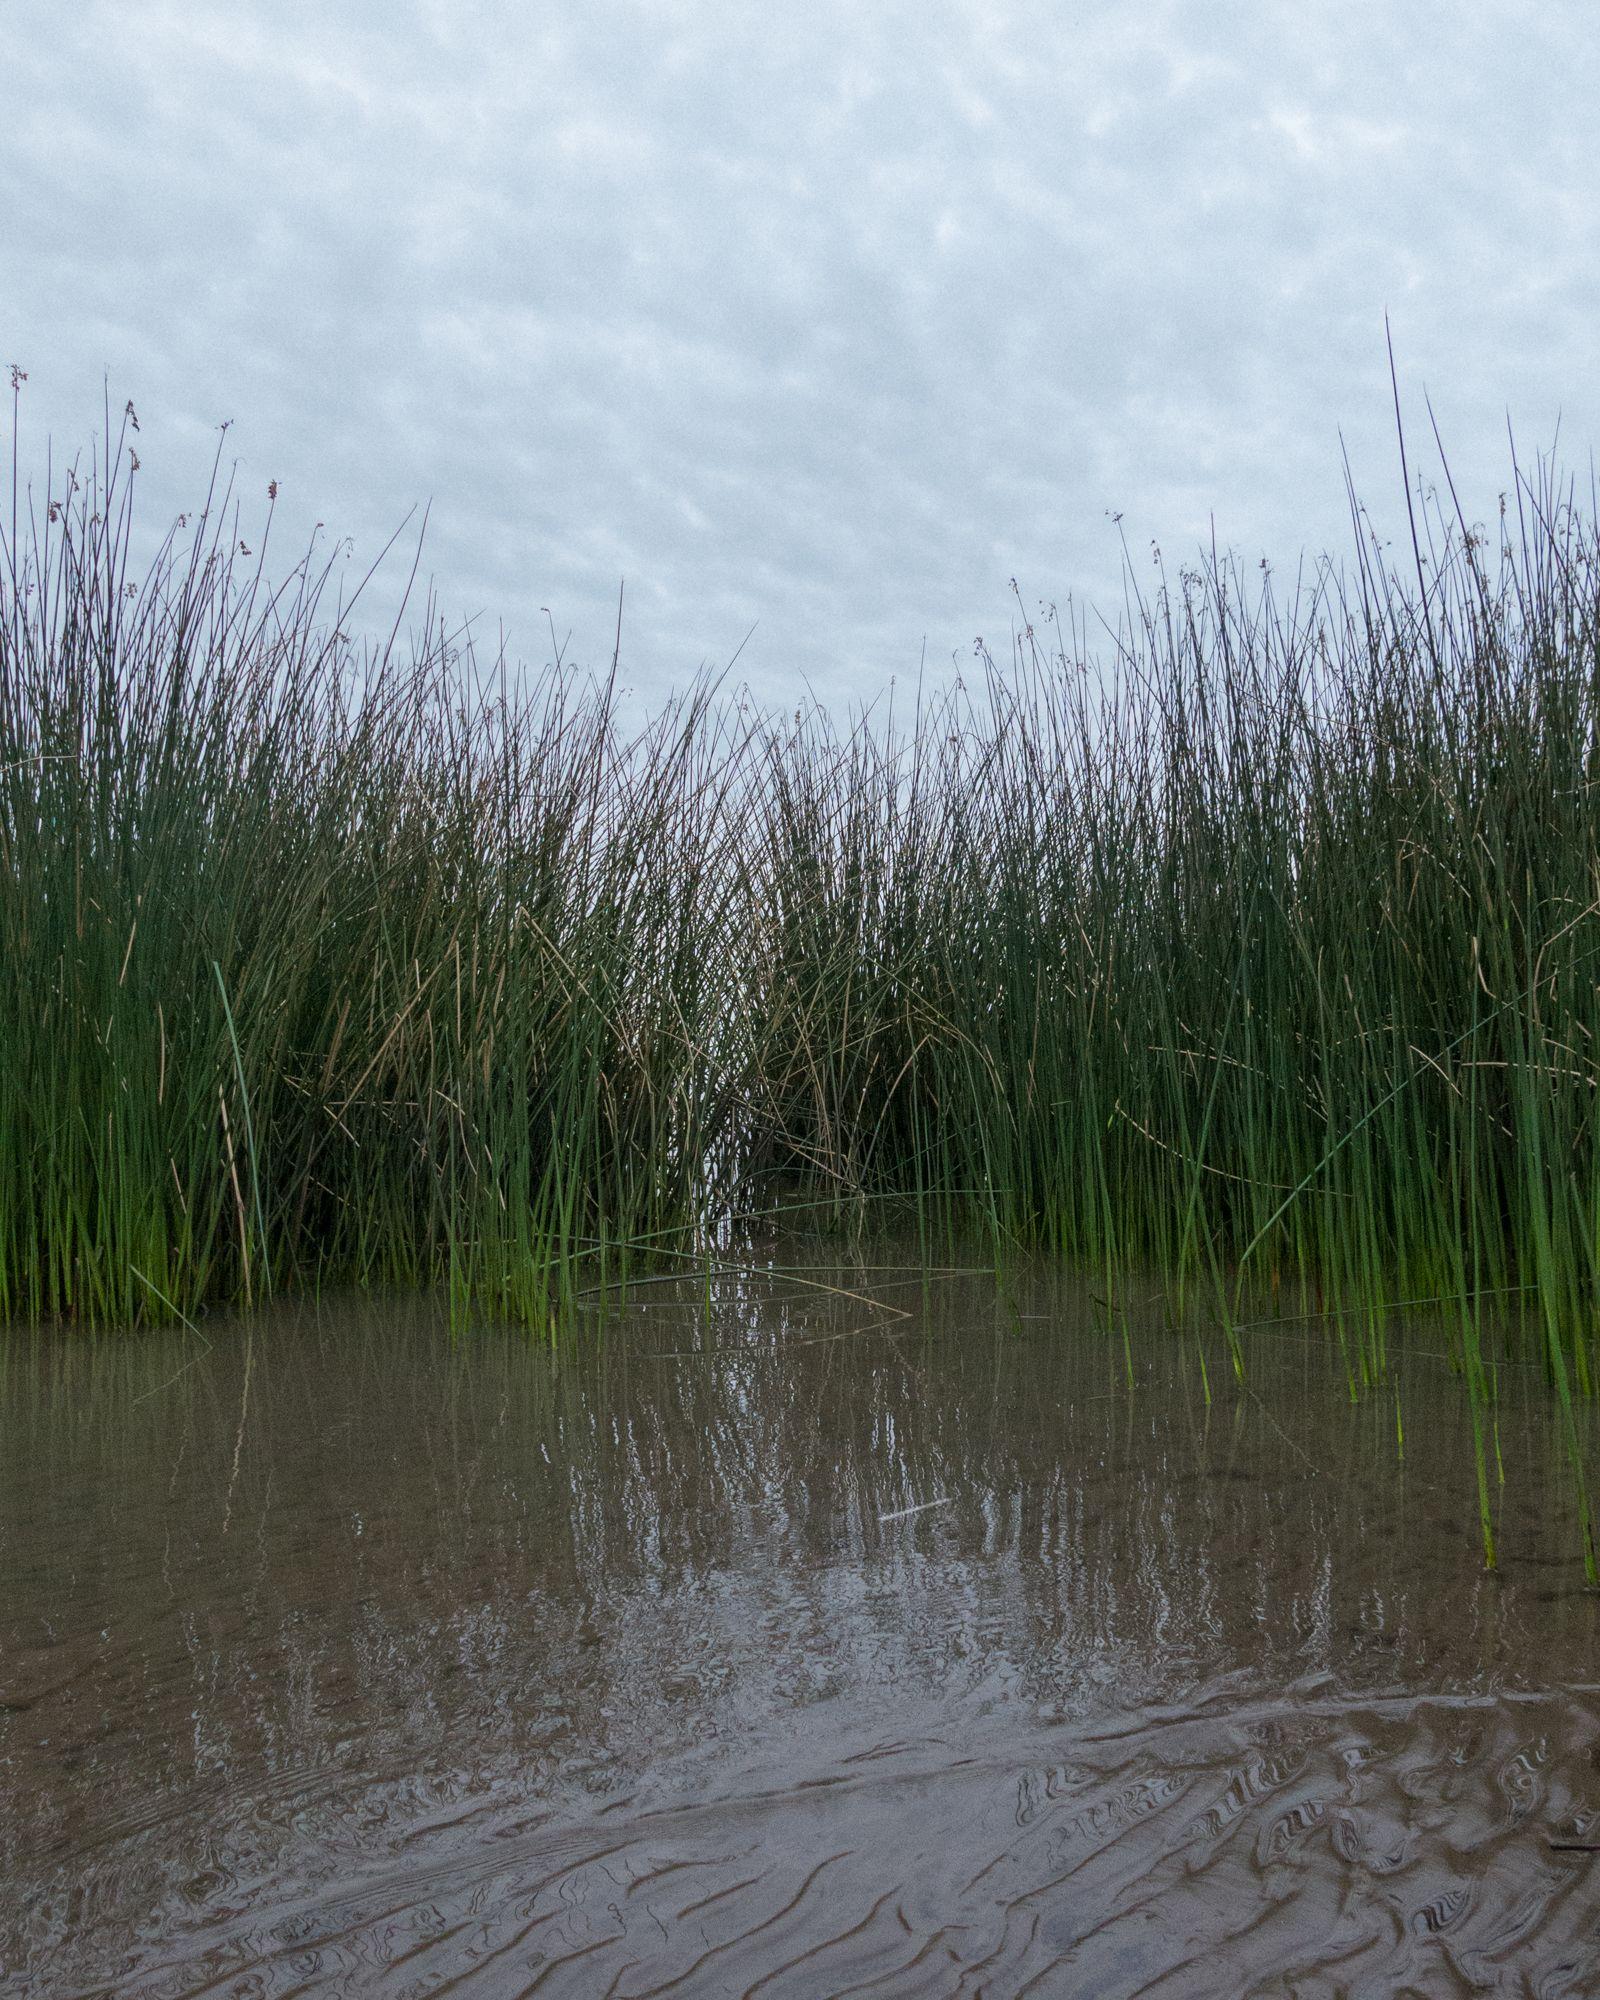 Ribera del Río de la Plata - Parque Natural Rivera Norte #01